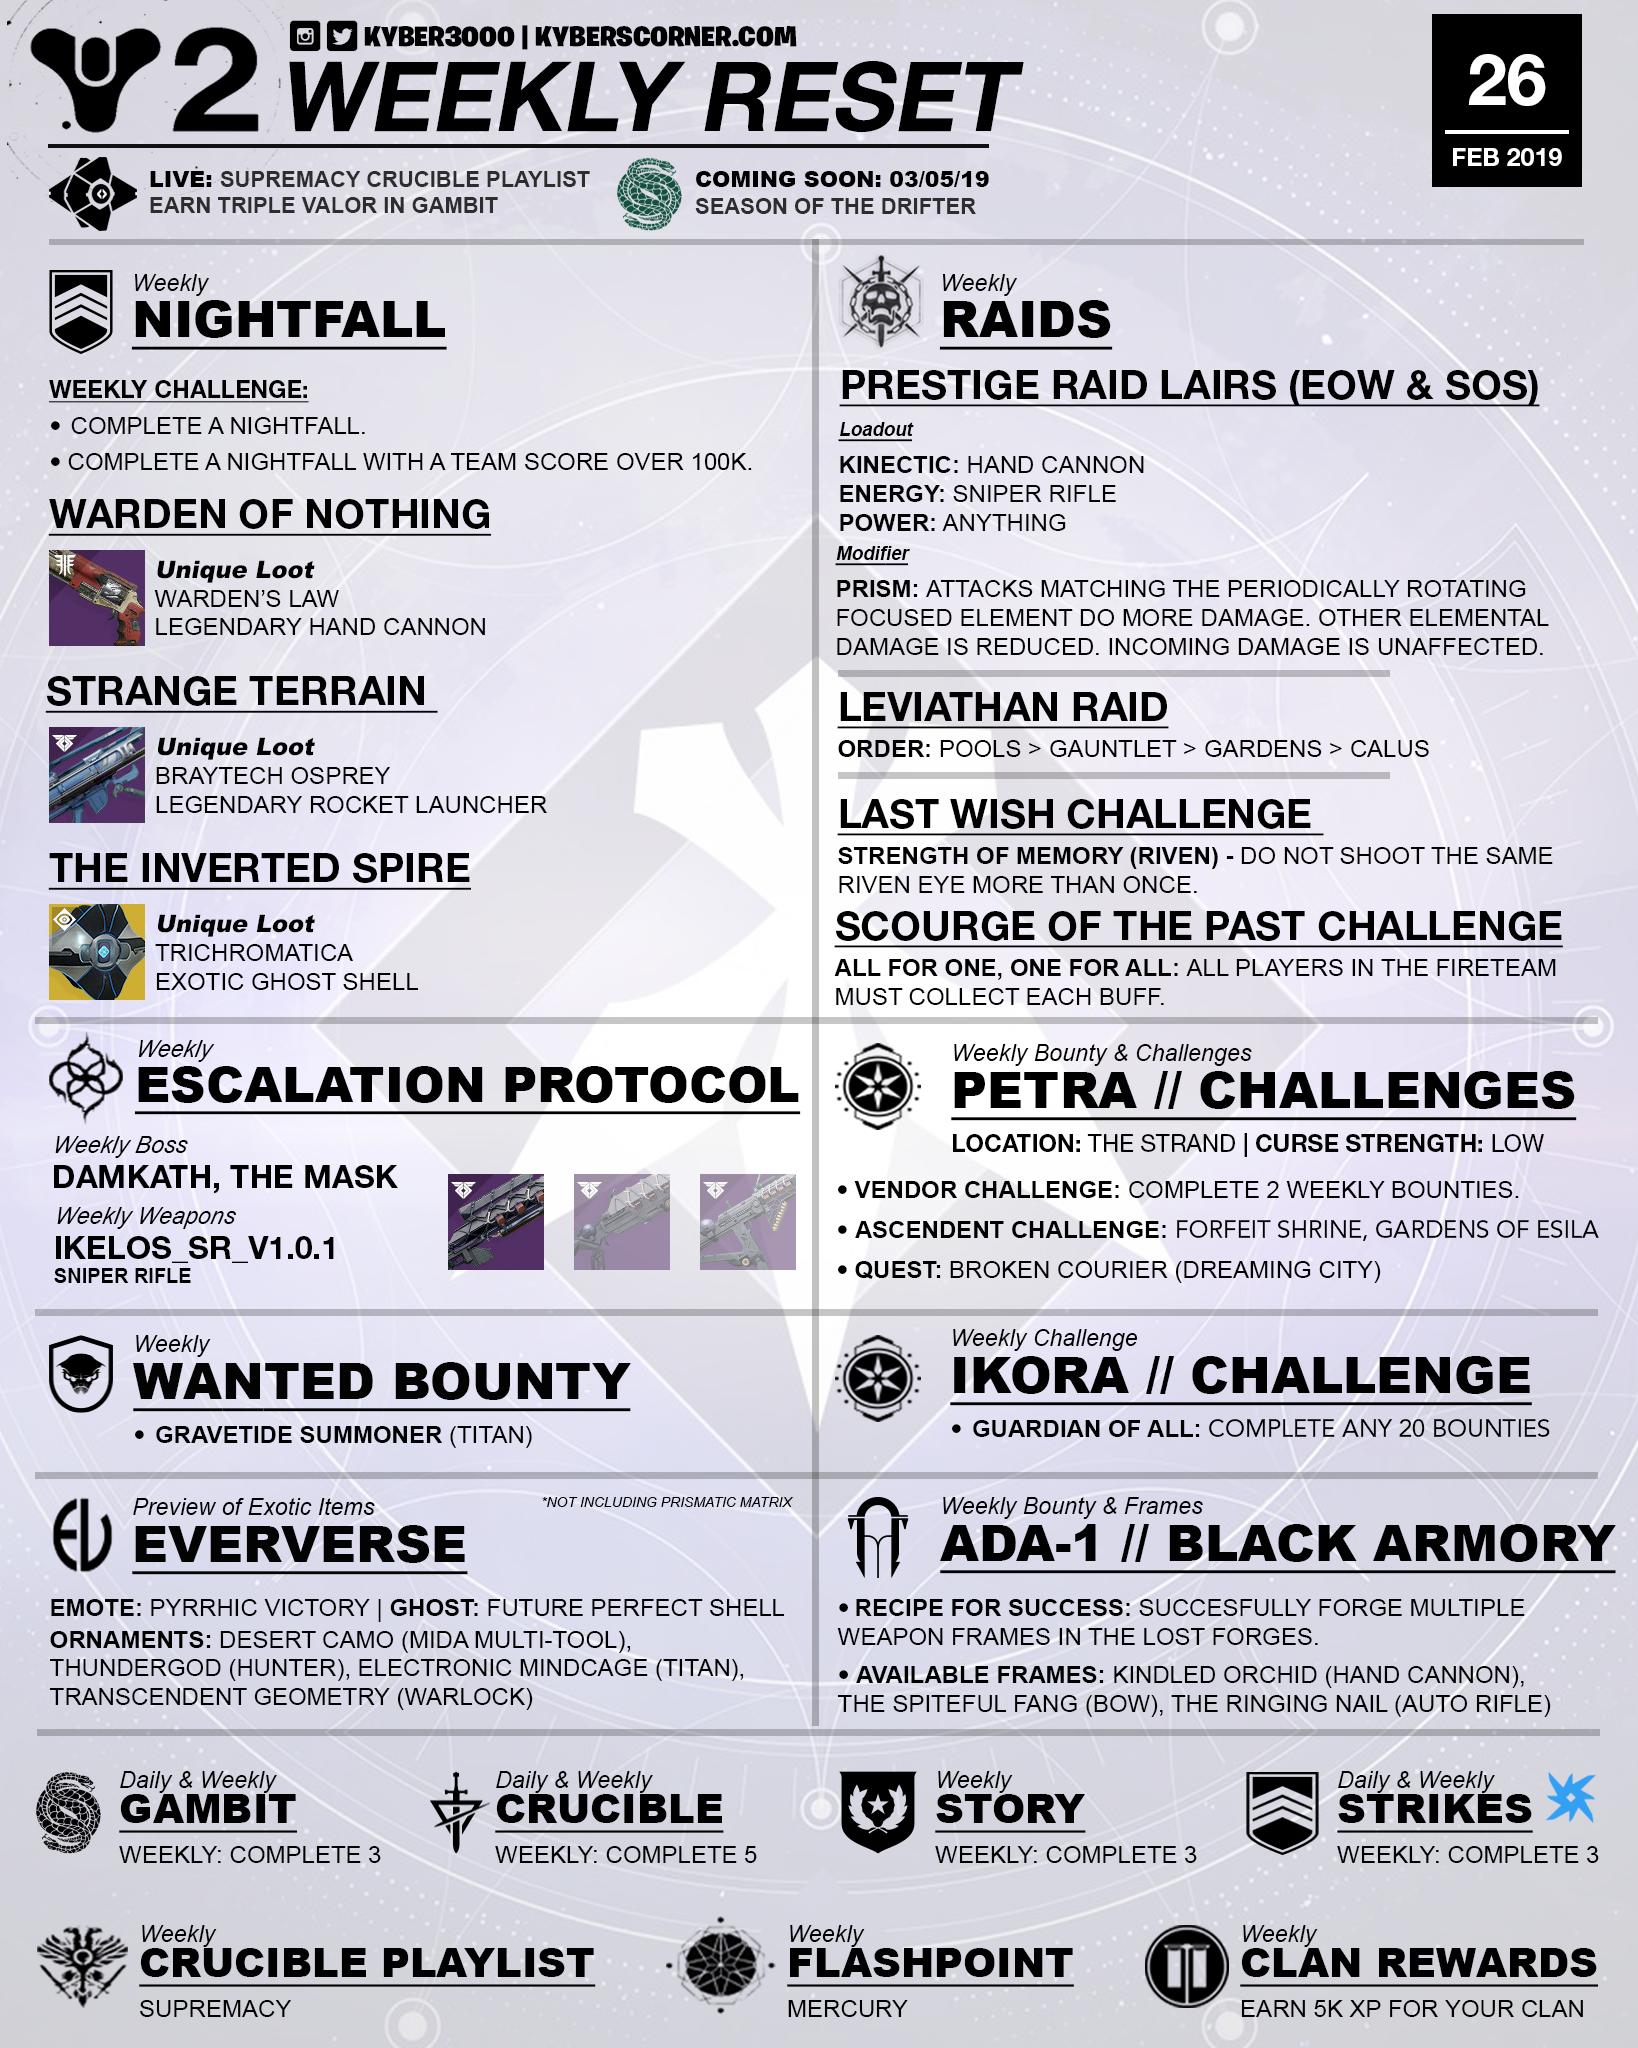 Destiny 2 Weekly Reset (02/26 – 03/05) – Kyber's Corner